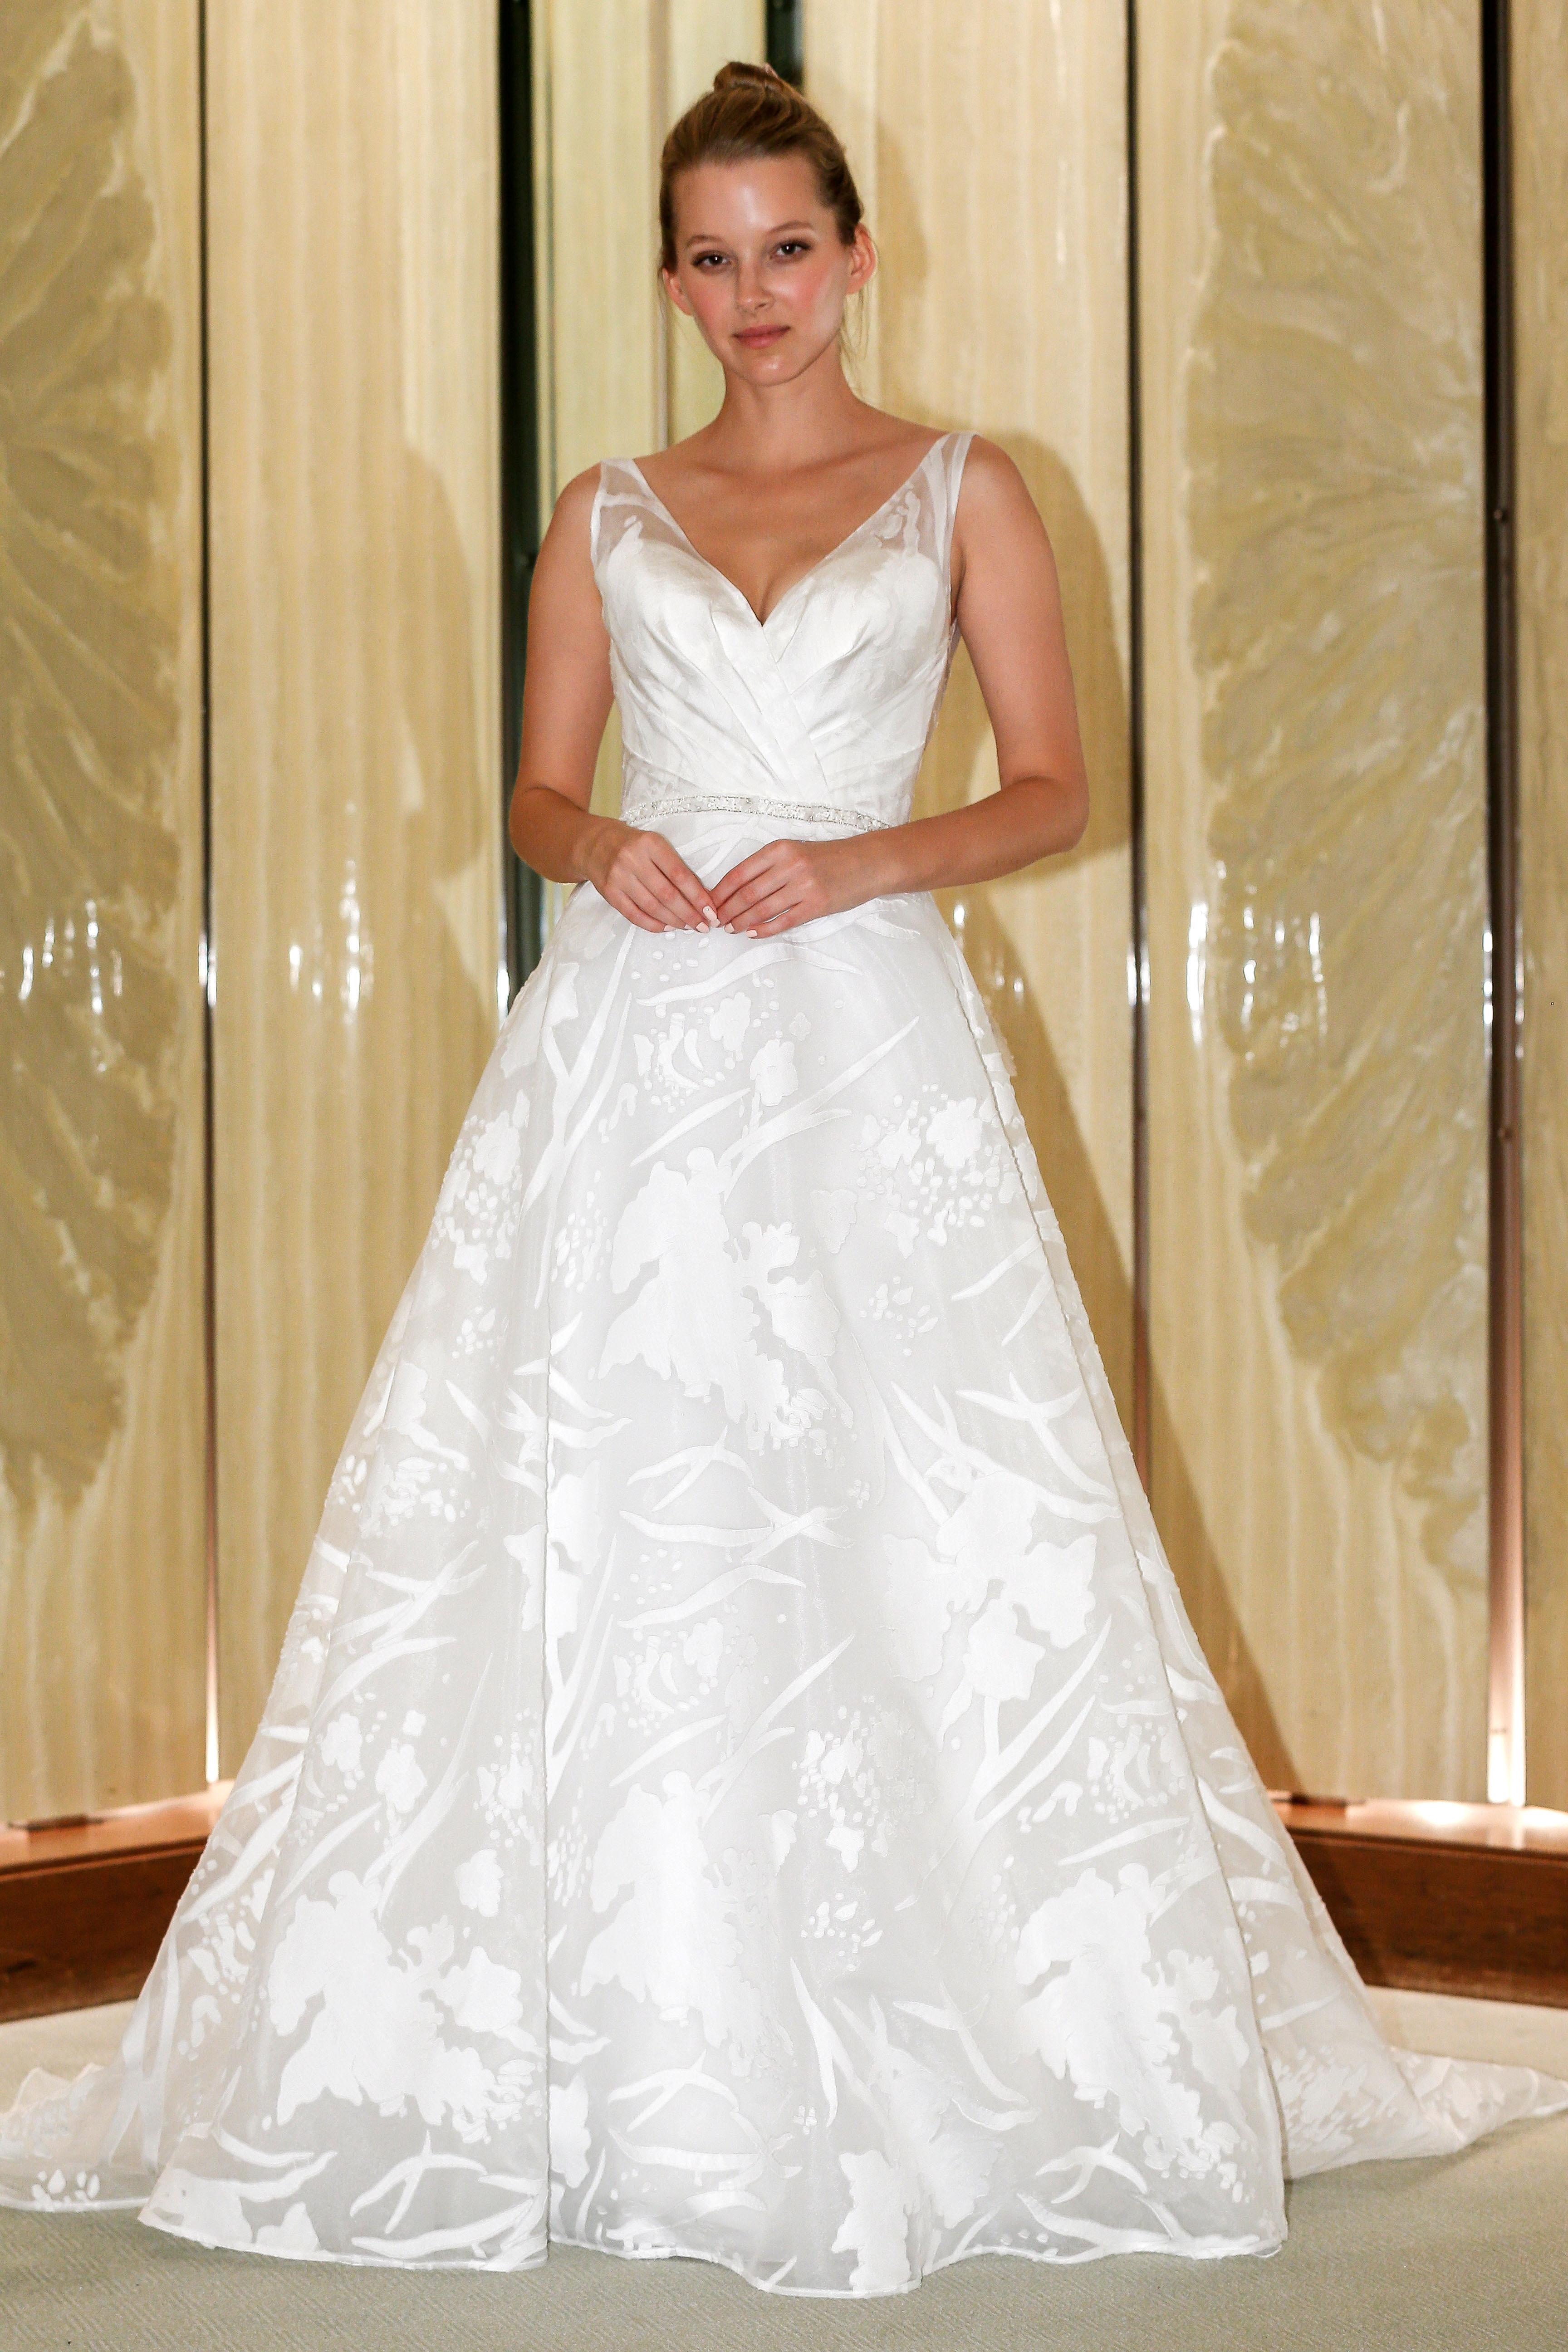 randy fenoli wedding dress v-neck a-line abstract design